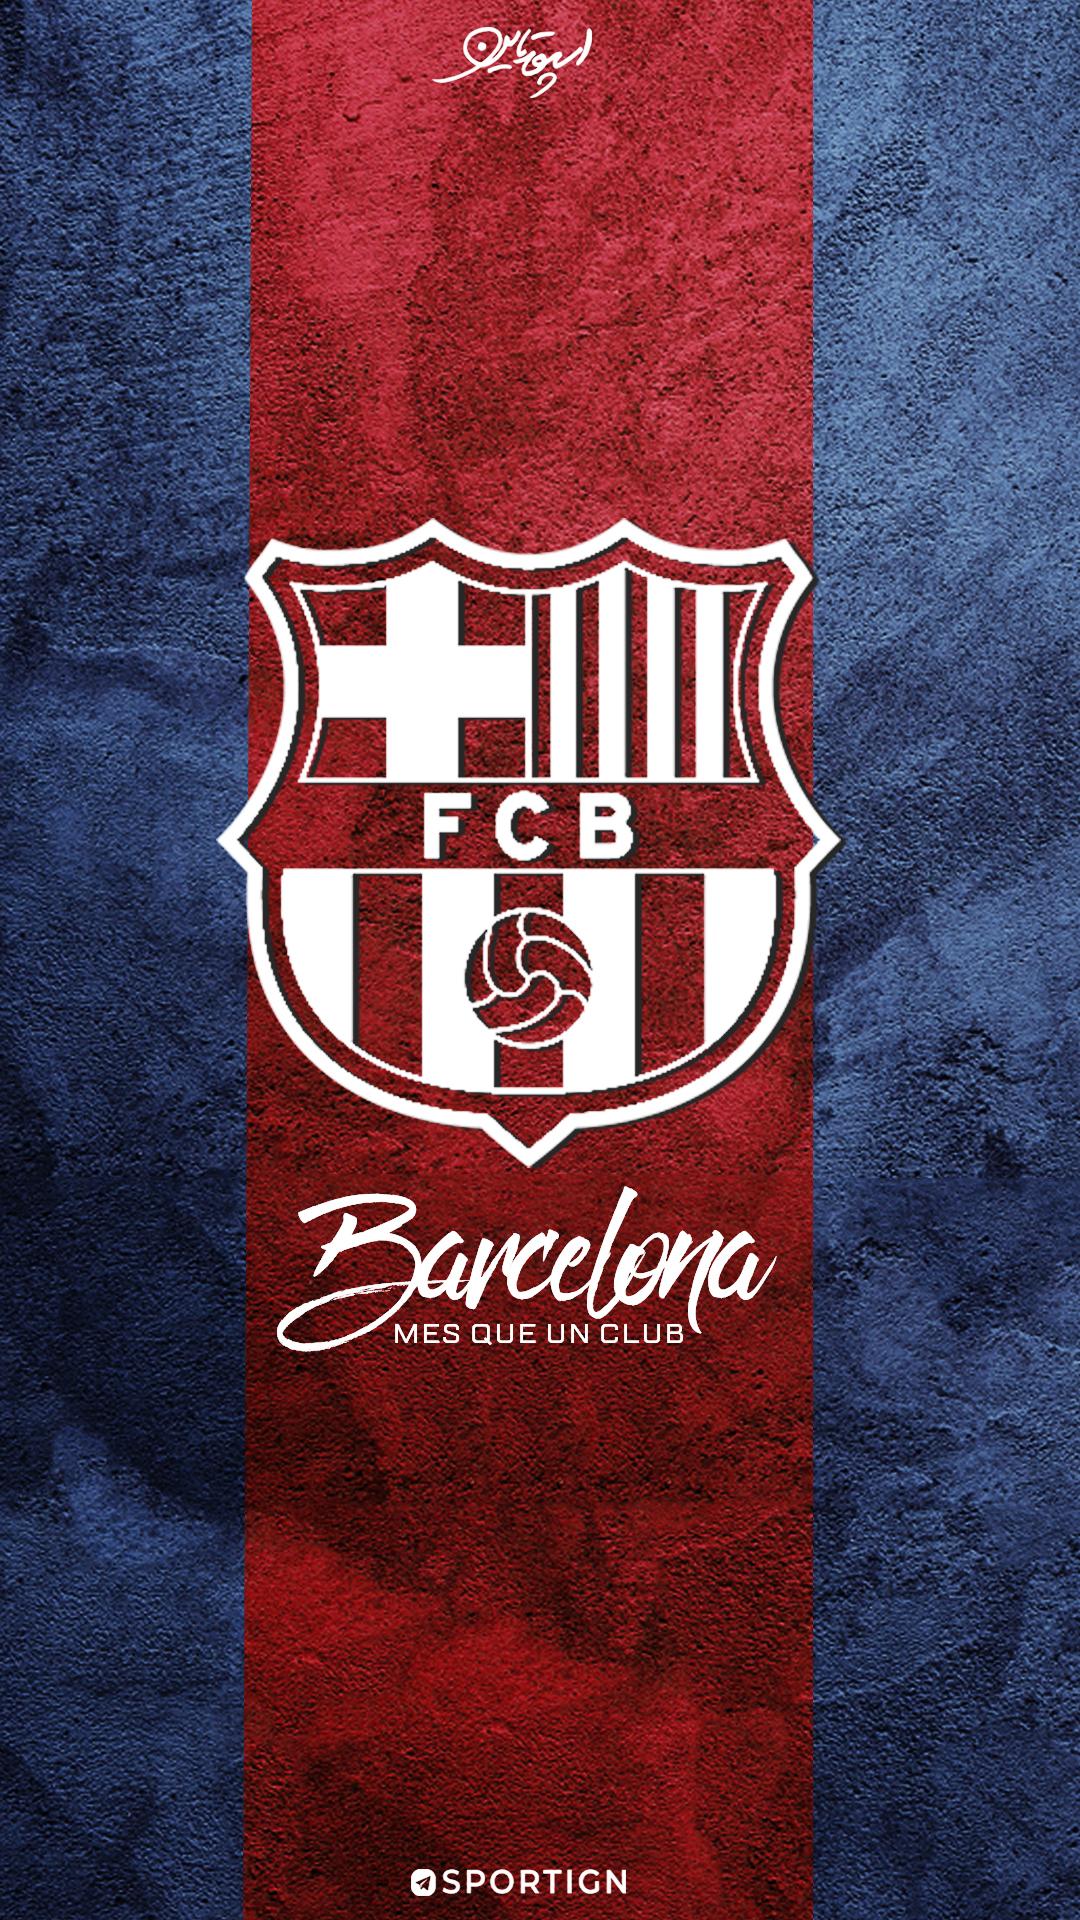 Wallpaper Barcelona Wallpaper Hd Android 1080x1920 Download Hd Wallpaper Wallpapertip